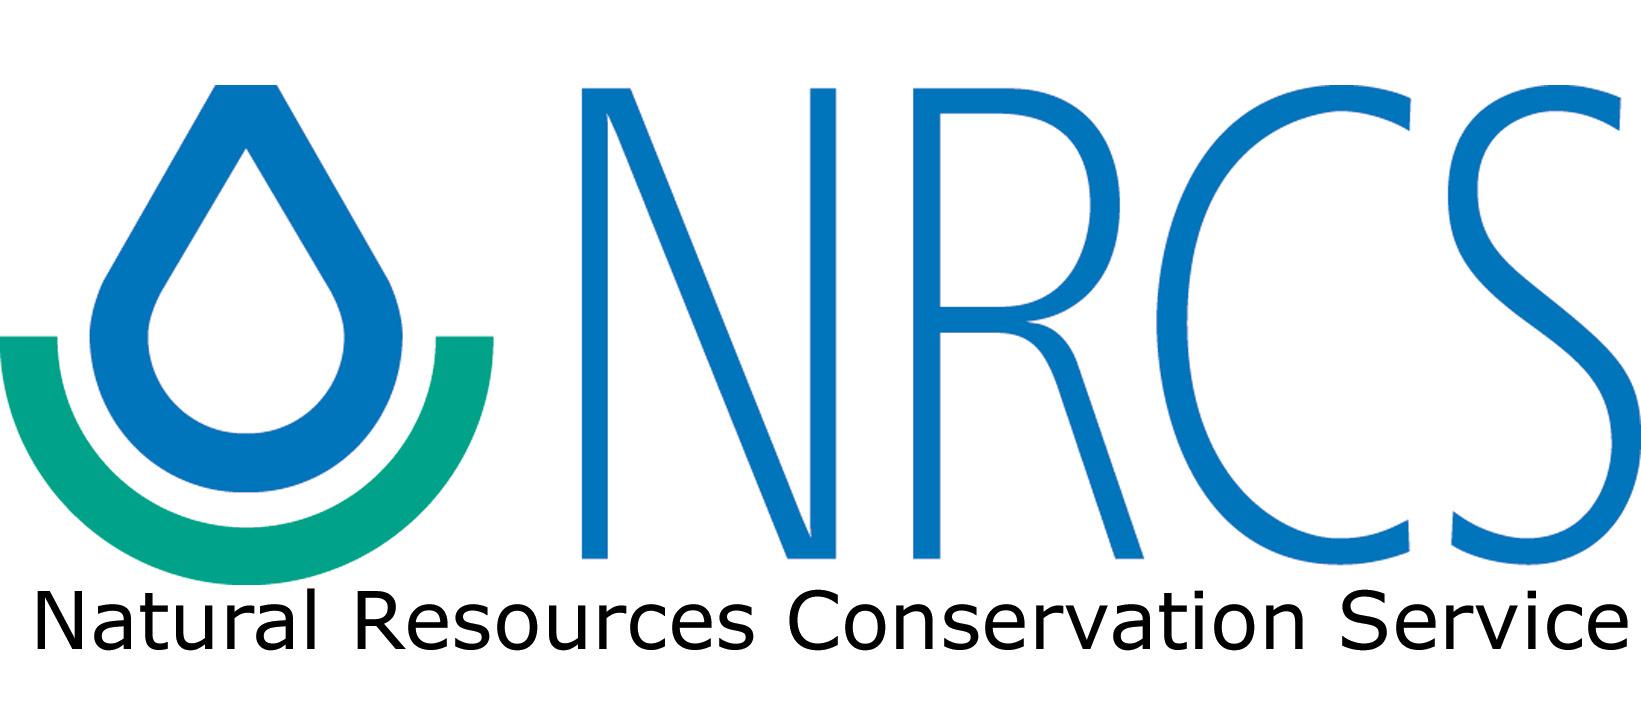 Kaitlin Farbotnik, NRCS - Natural Resources Conservation Service